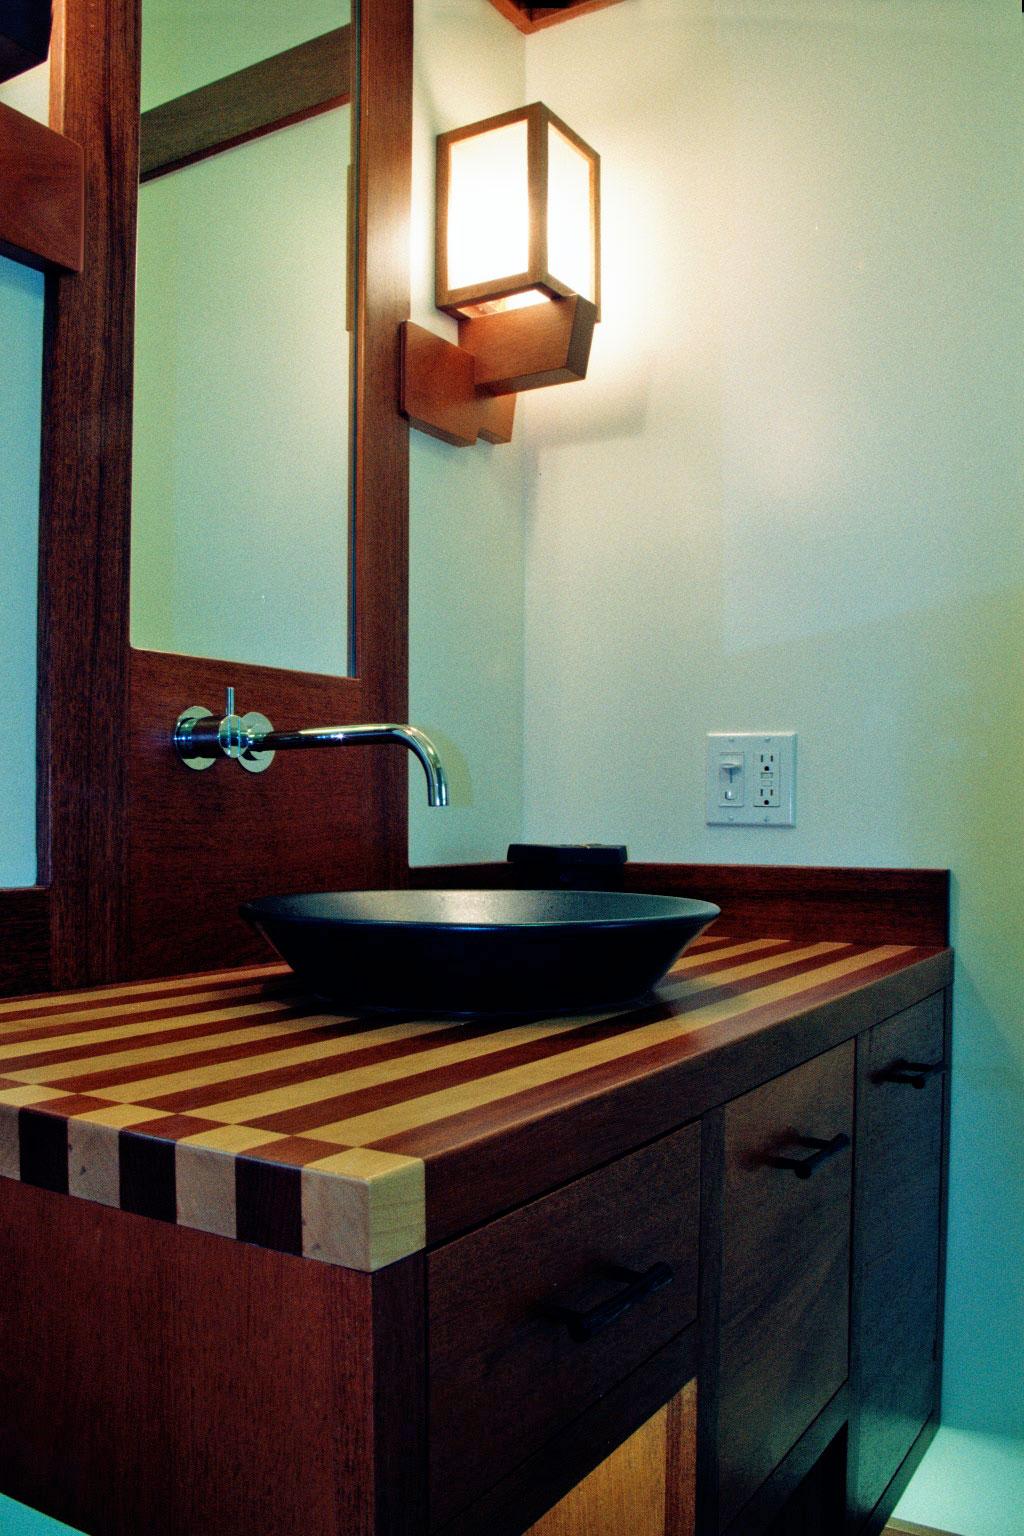 Japan Inspired Powder Room